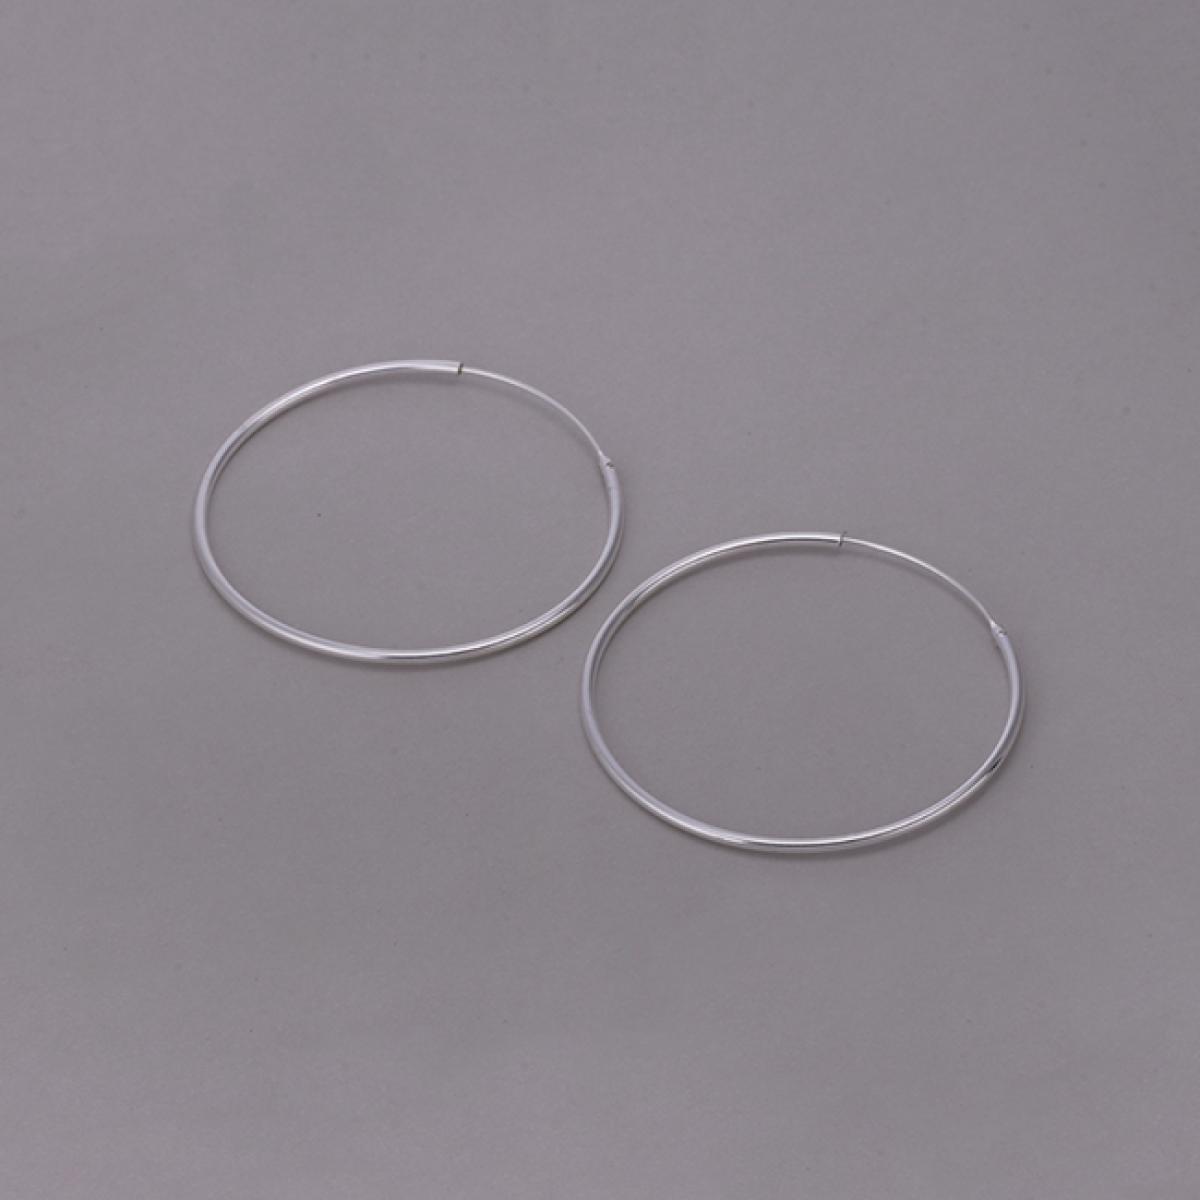 Brinco de Argola 5,5cm - Prata Branca